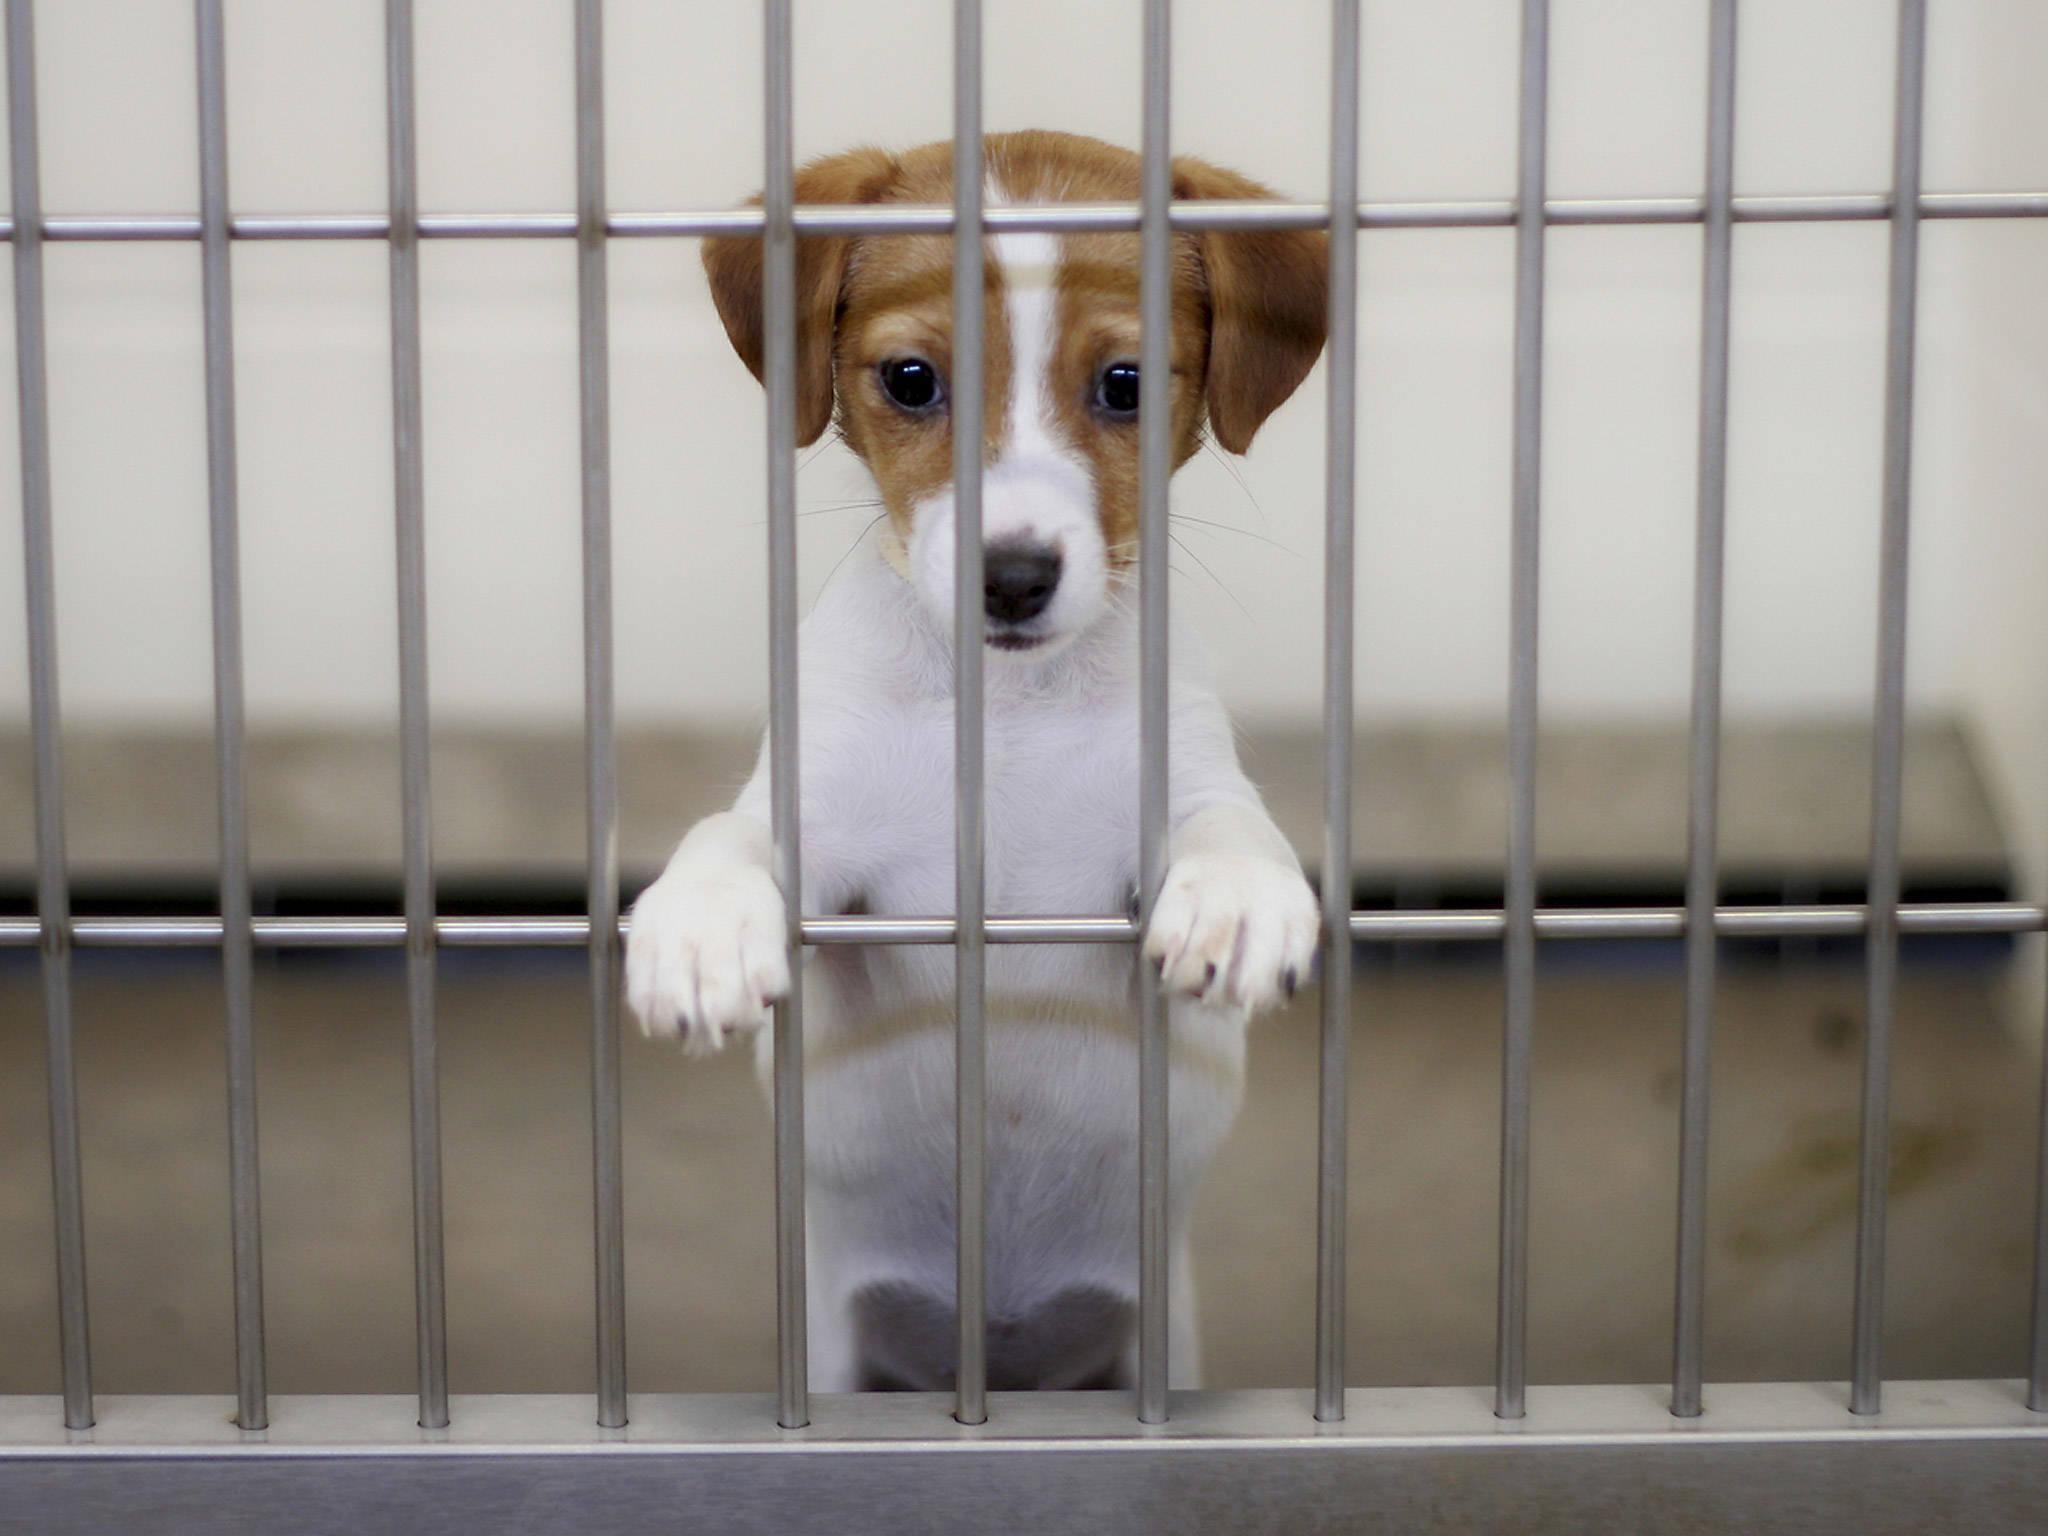 4fe79f597d4f4184f307_puppies-caged-1.jpg